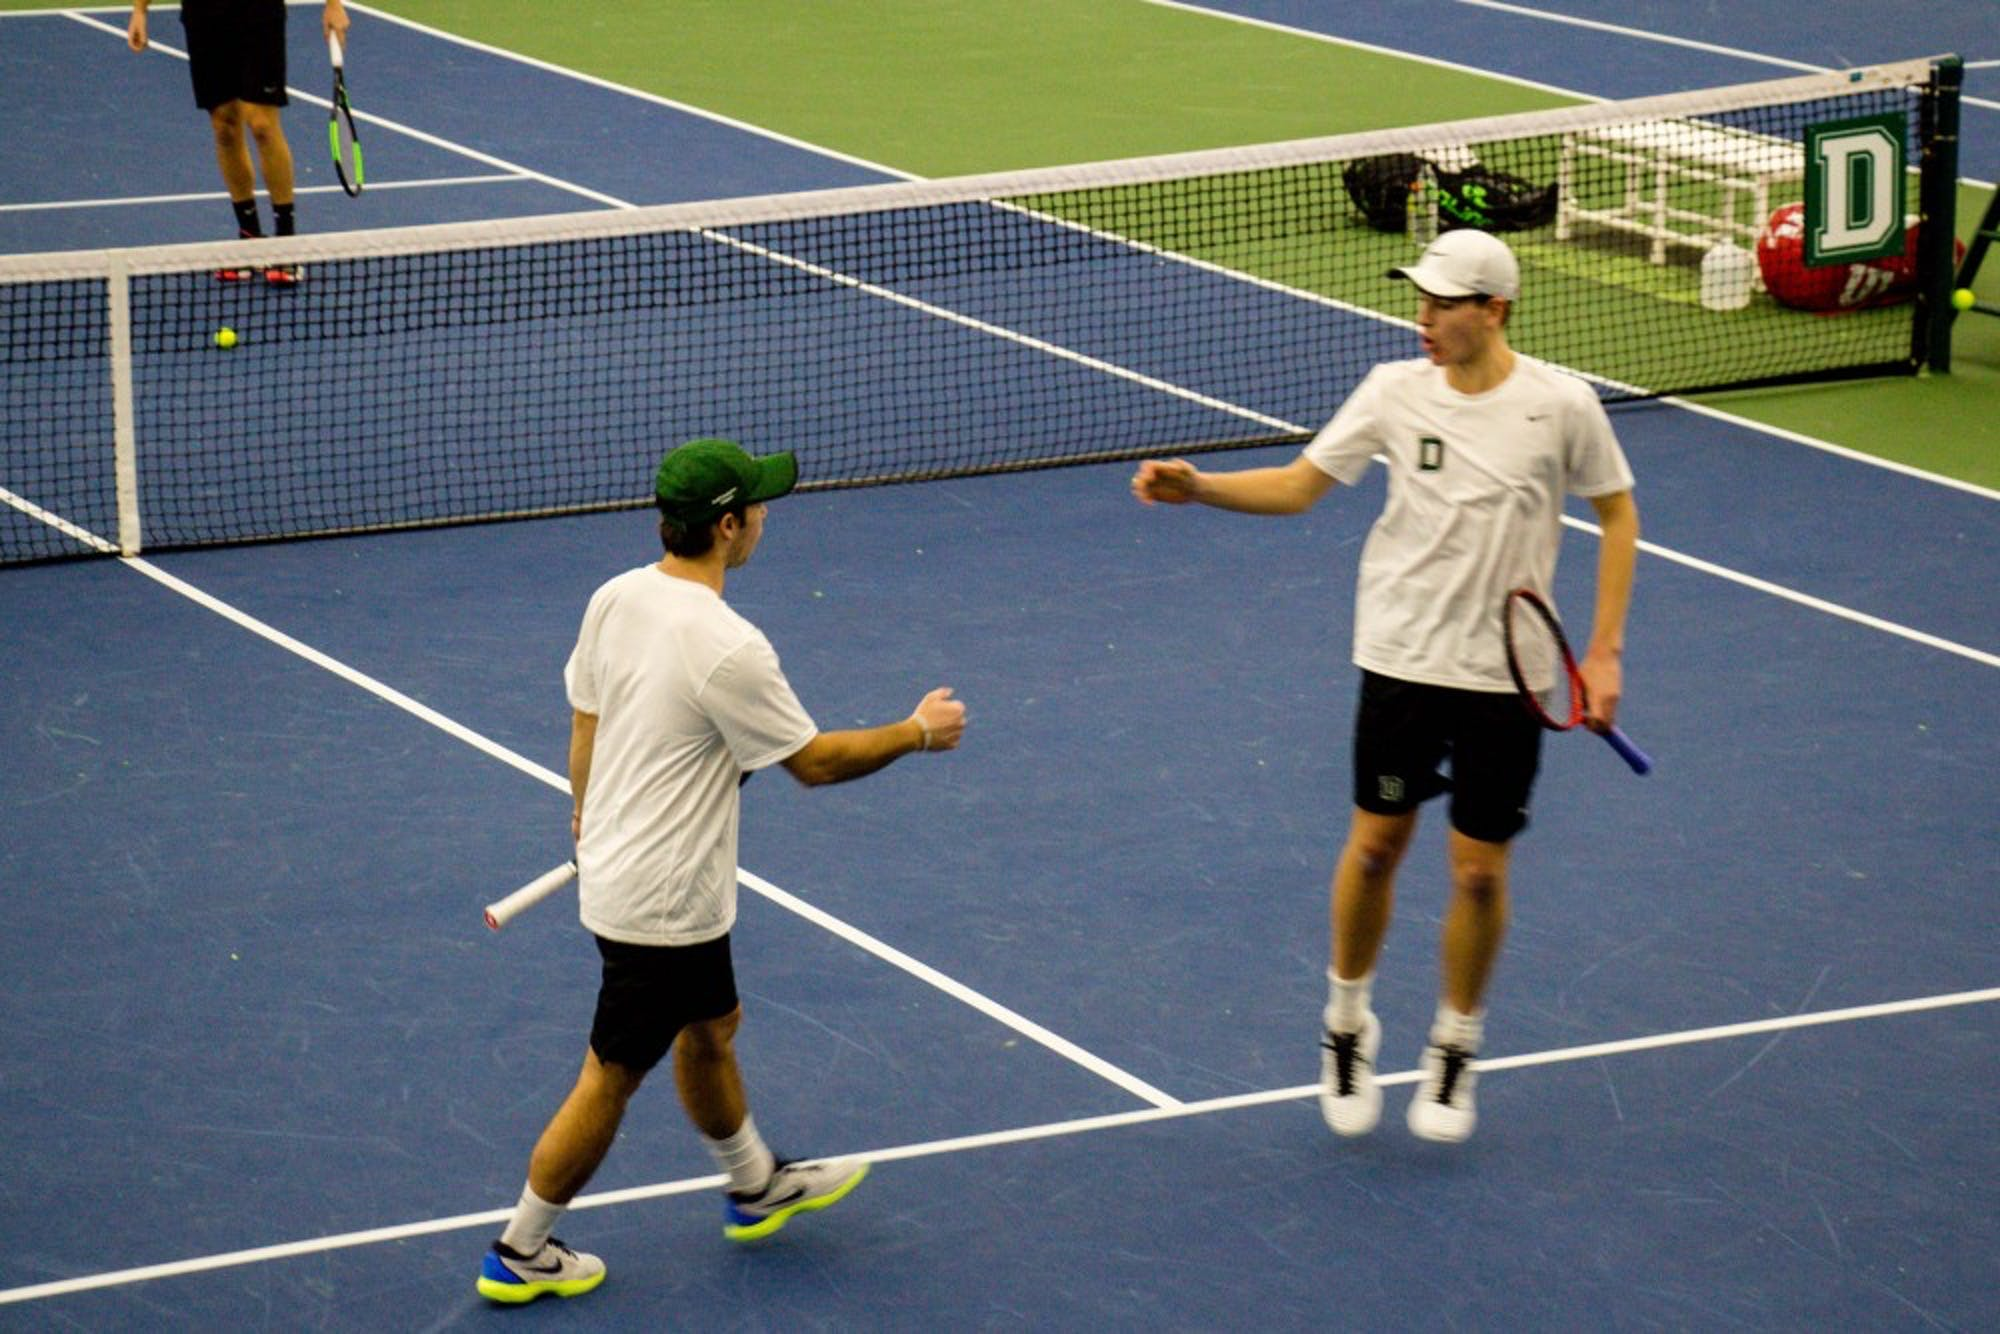 4-15-19-tennis-nataliedameron-1